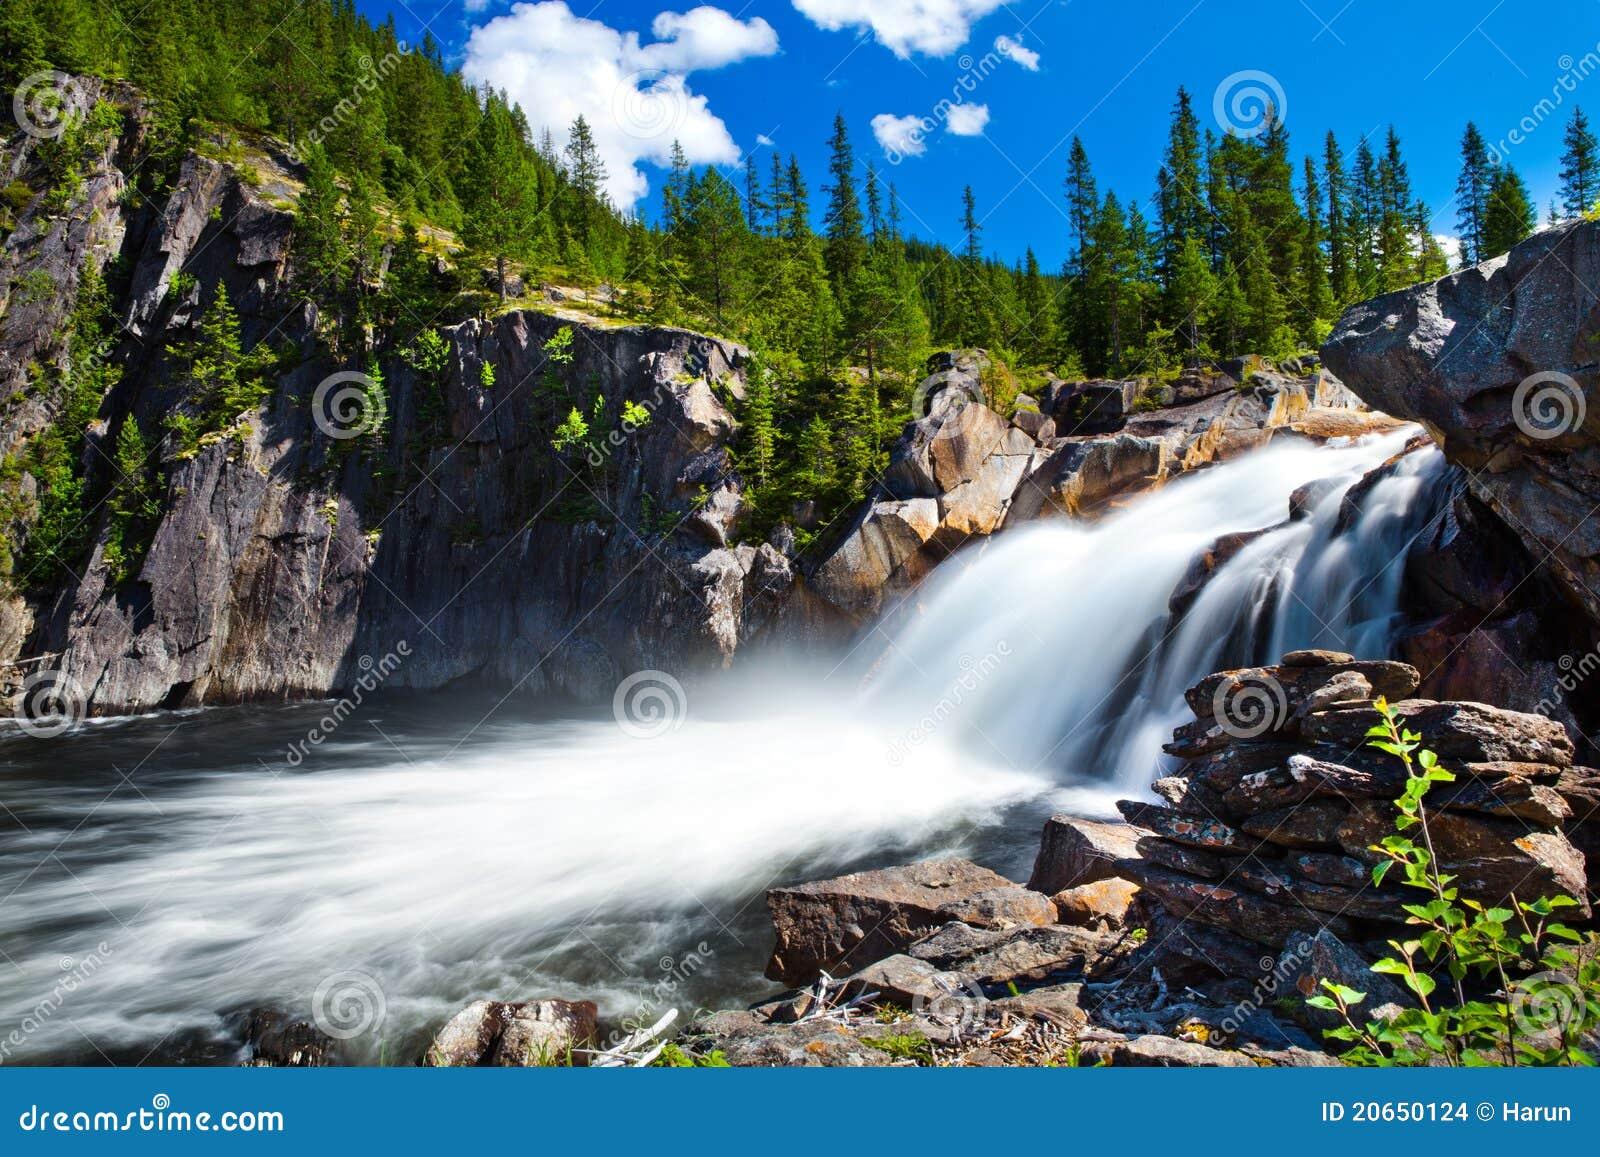 Waterfall of Norway